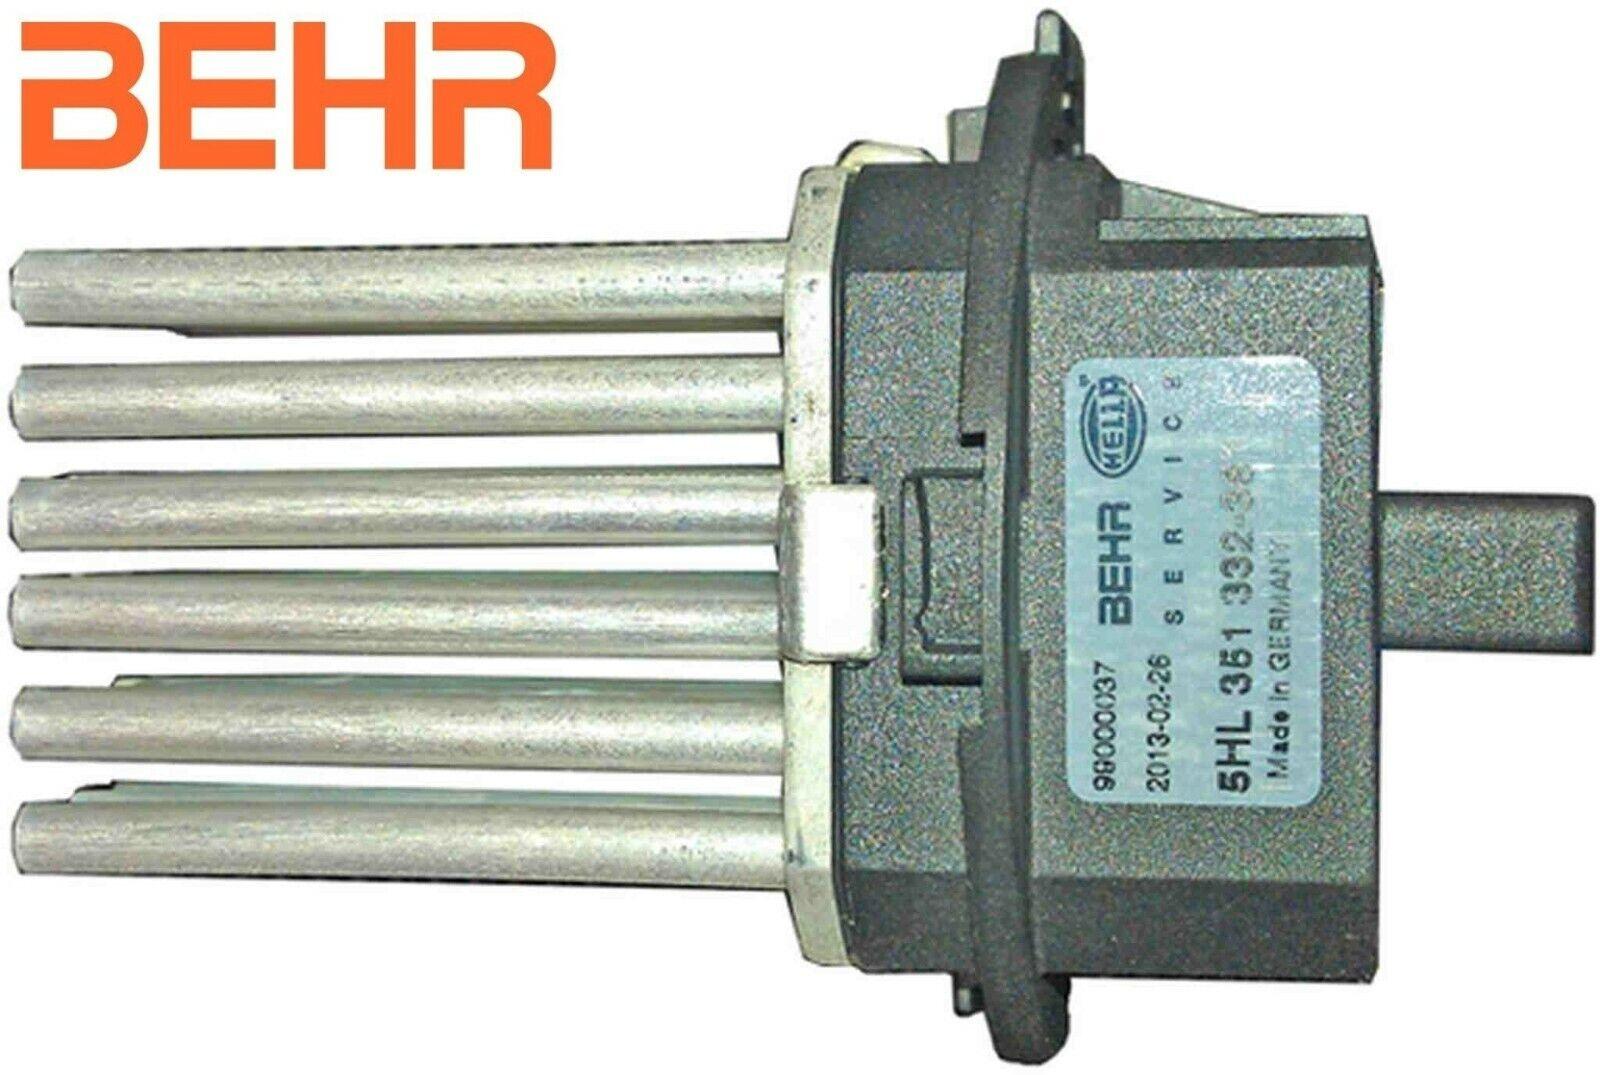 220 V controlador de calefacci/ón central VOVOL LY-7000B Regulador de termostato mec/ánico para habitaci/ón termostato tipo esfera color blanco